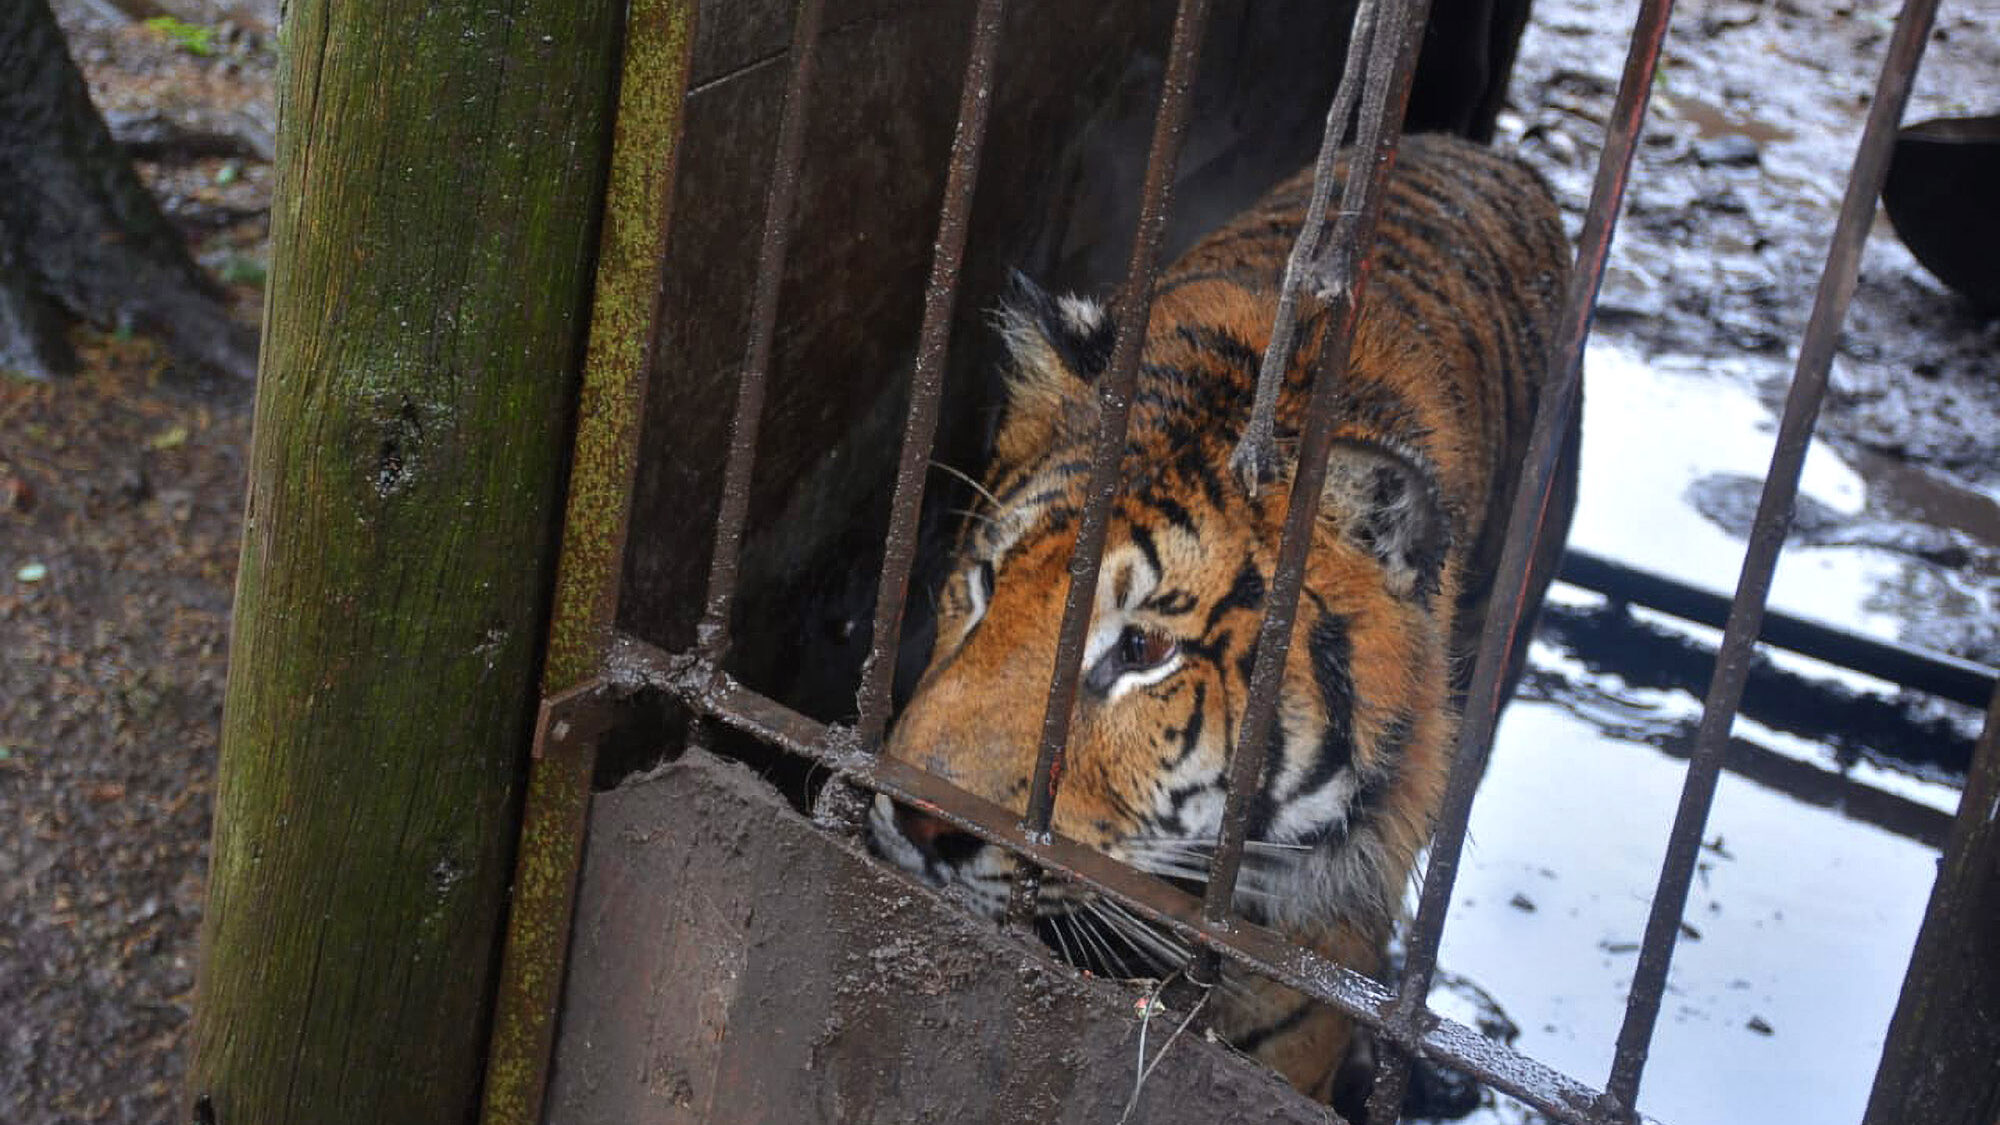 Horror Farm Bred Tigers and Pumas to Pleasure 'Hunters'